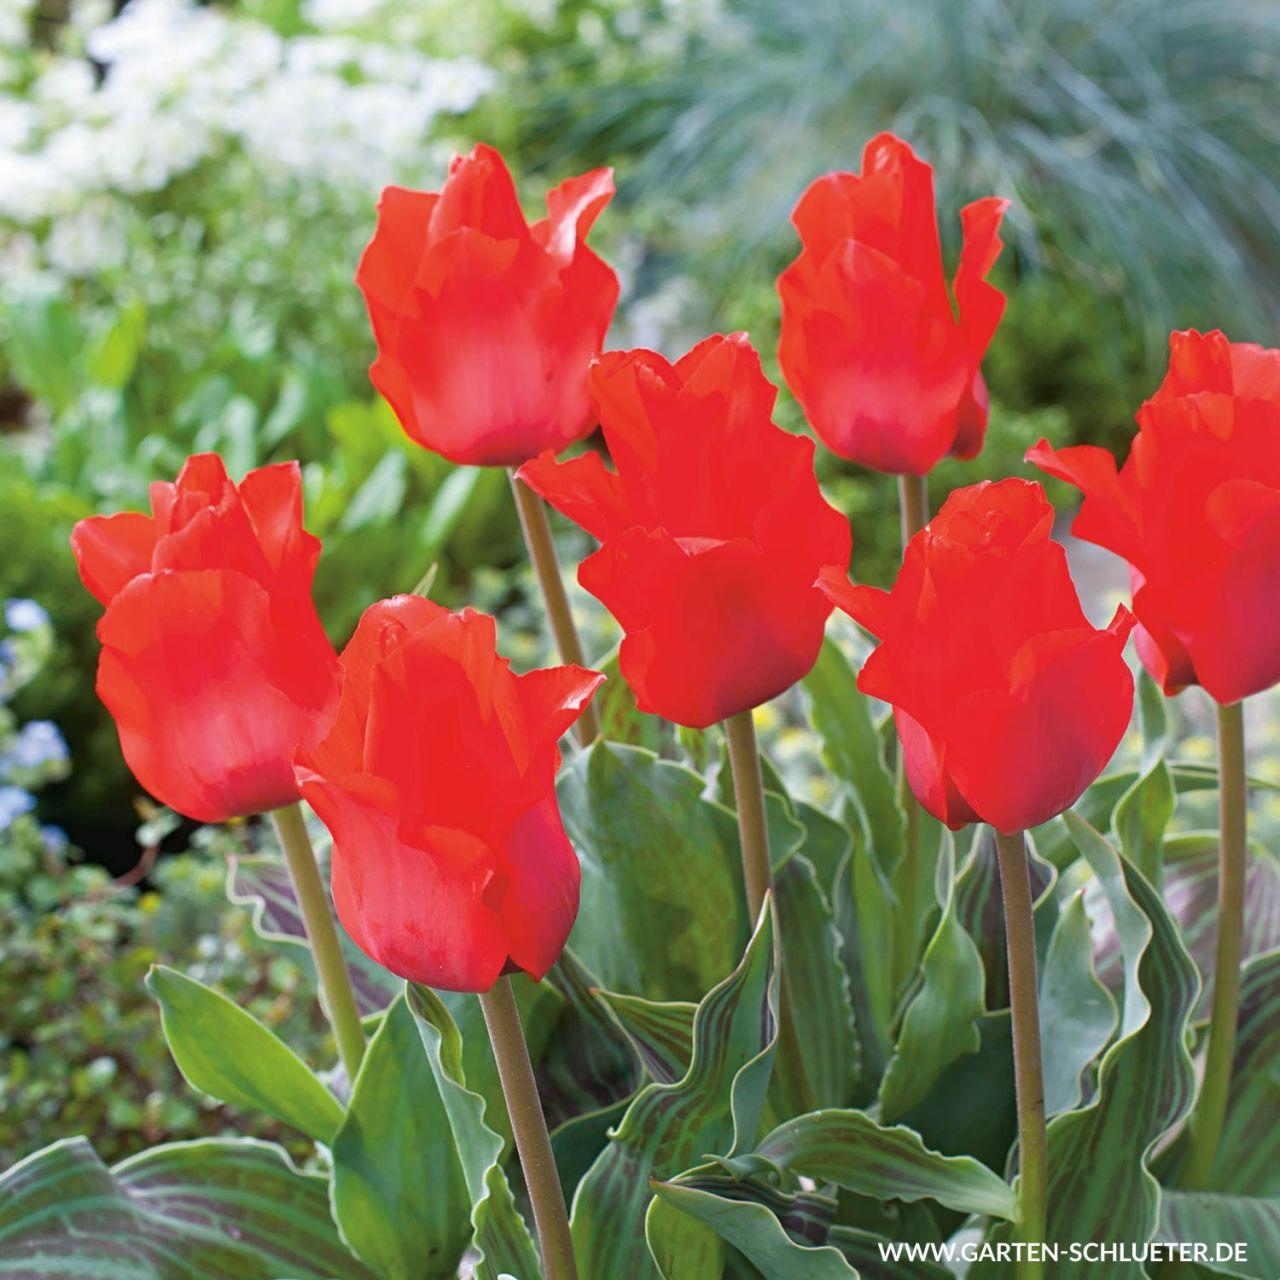 Garten-Schlueter.de: Botanische Tulpe Rotkäppchen - 10 Stück